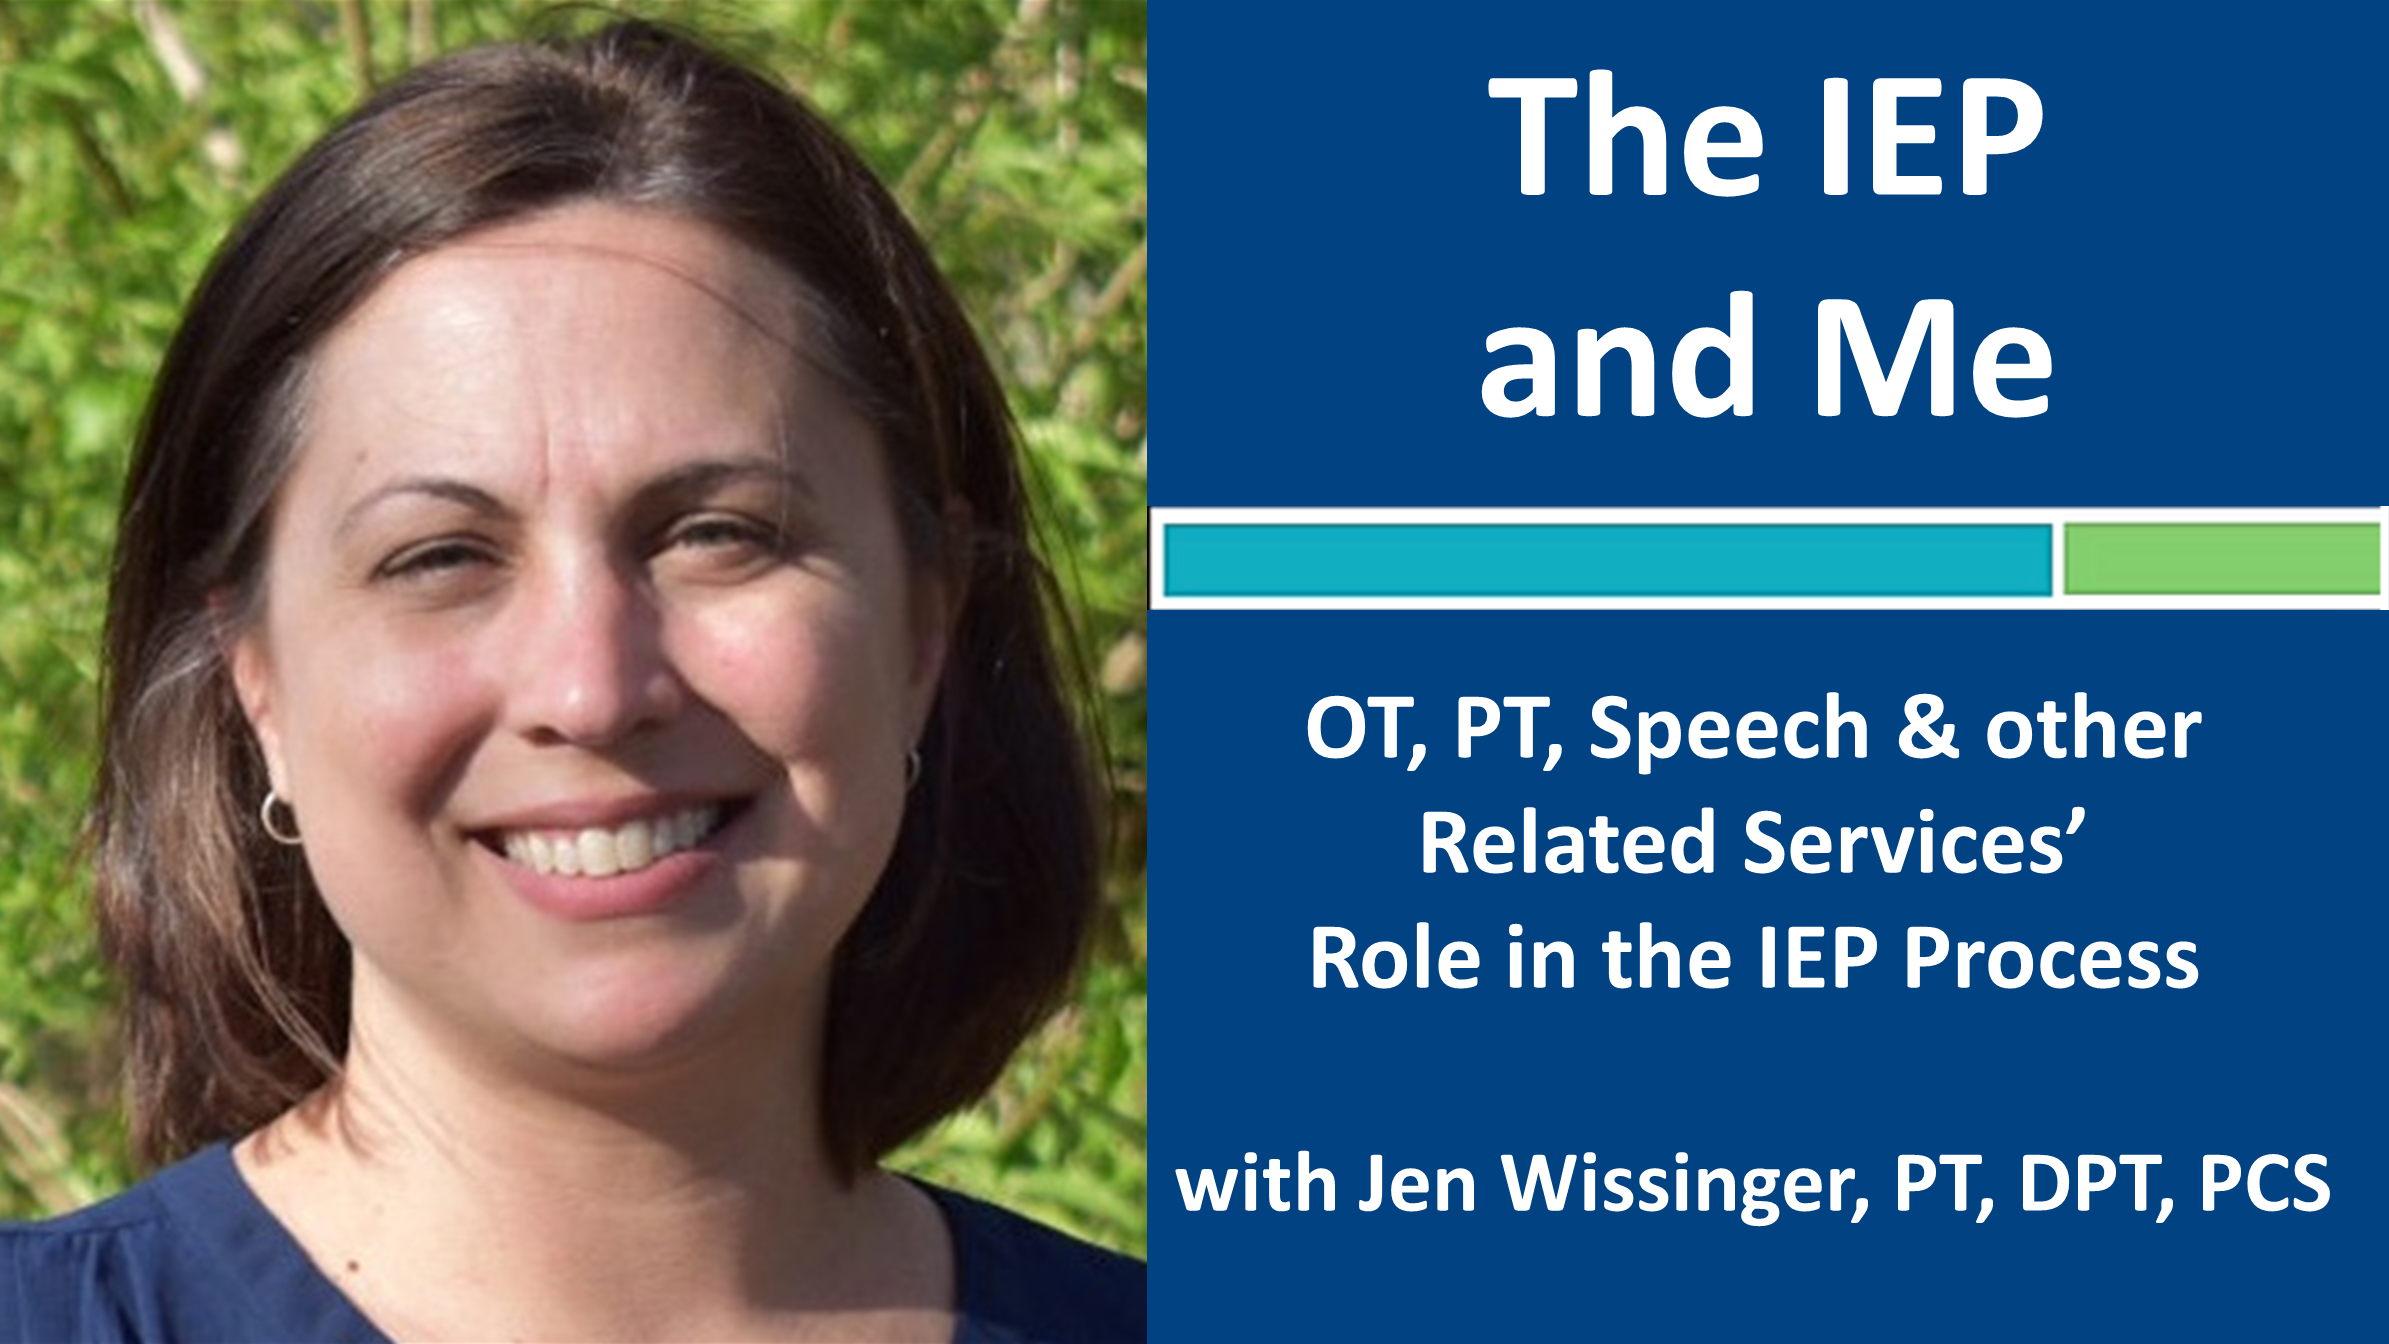 Webinar 2: The IEP and Me with Jennifer Wissinger, PT, DPT